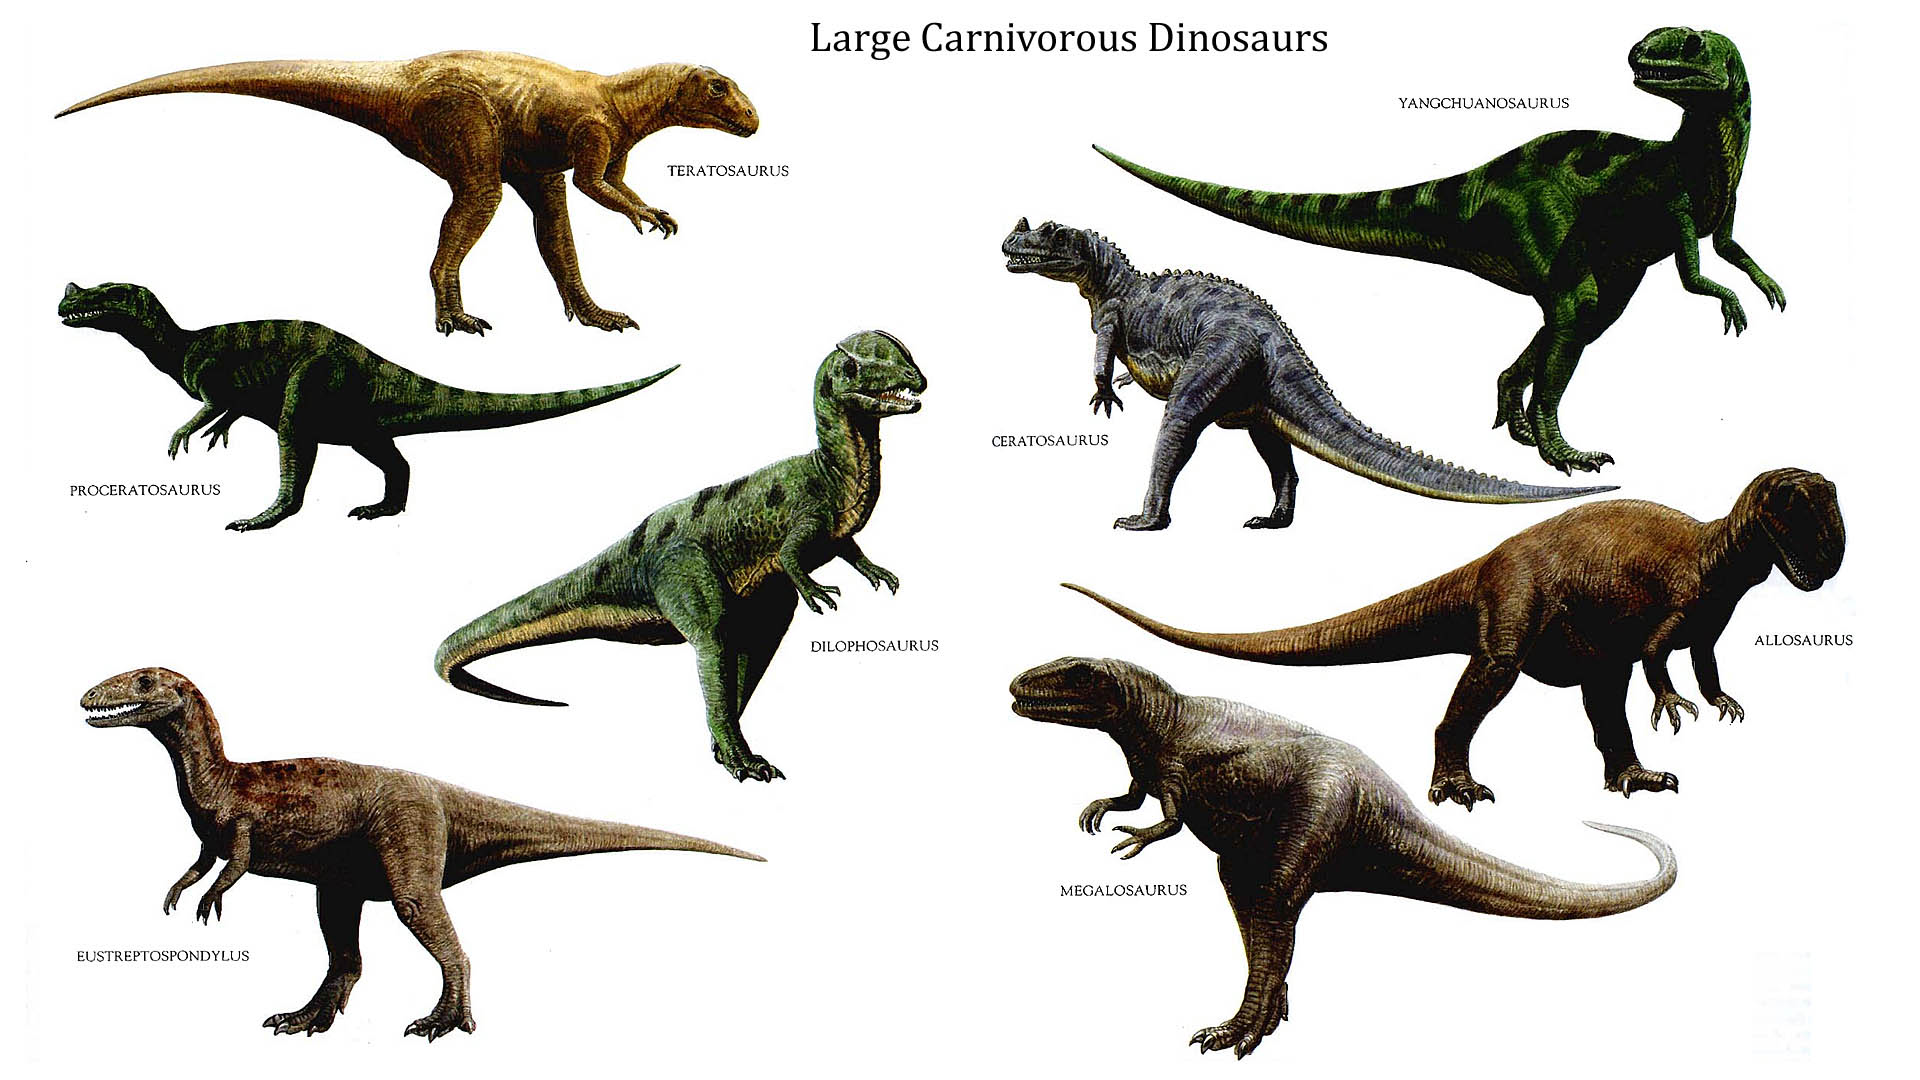 carnivorousdinosaurs.jpg 1,920×1,080 pixels Prehistoric